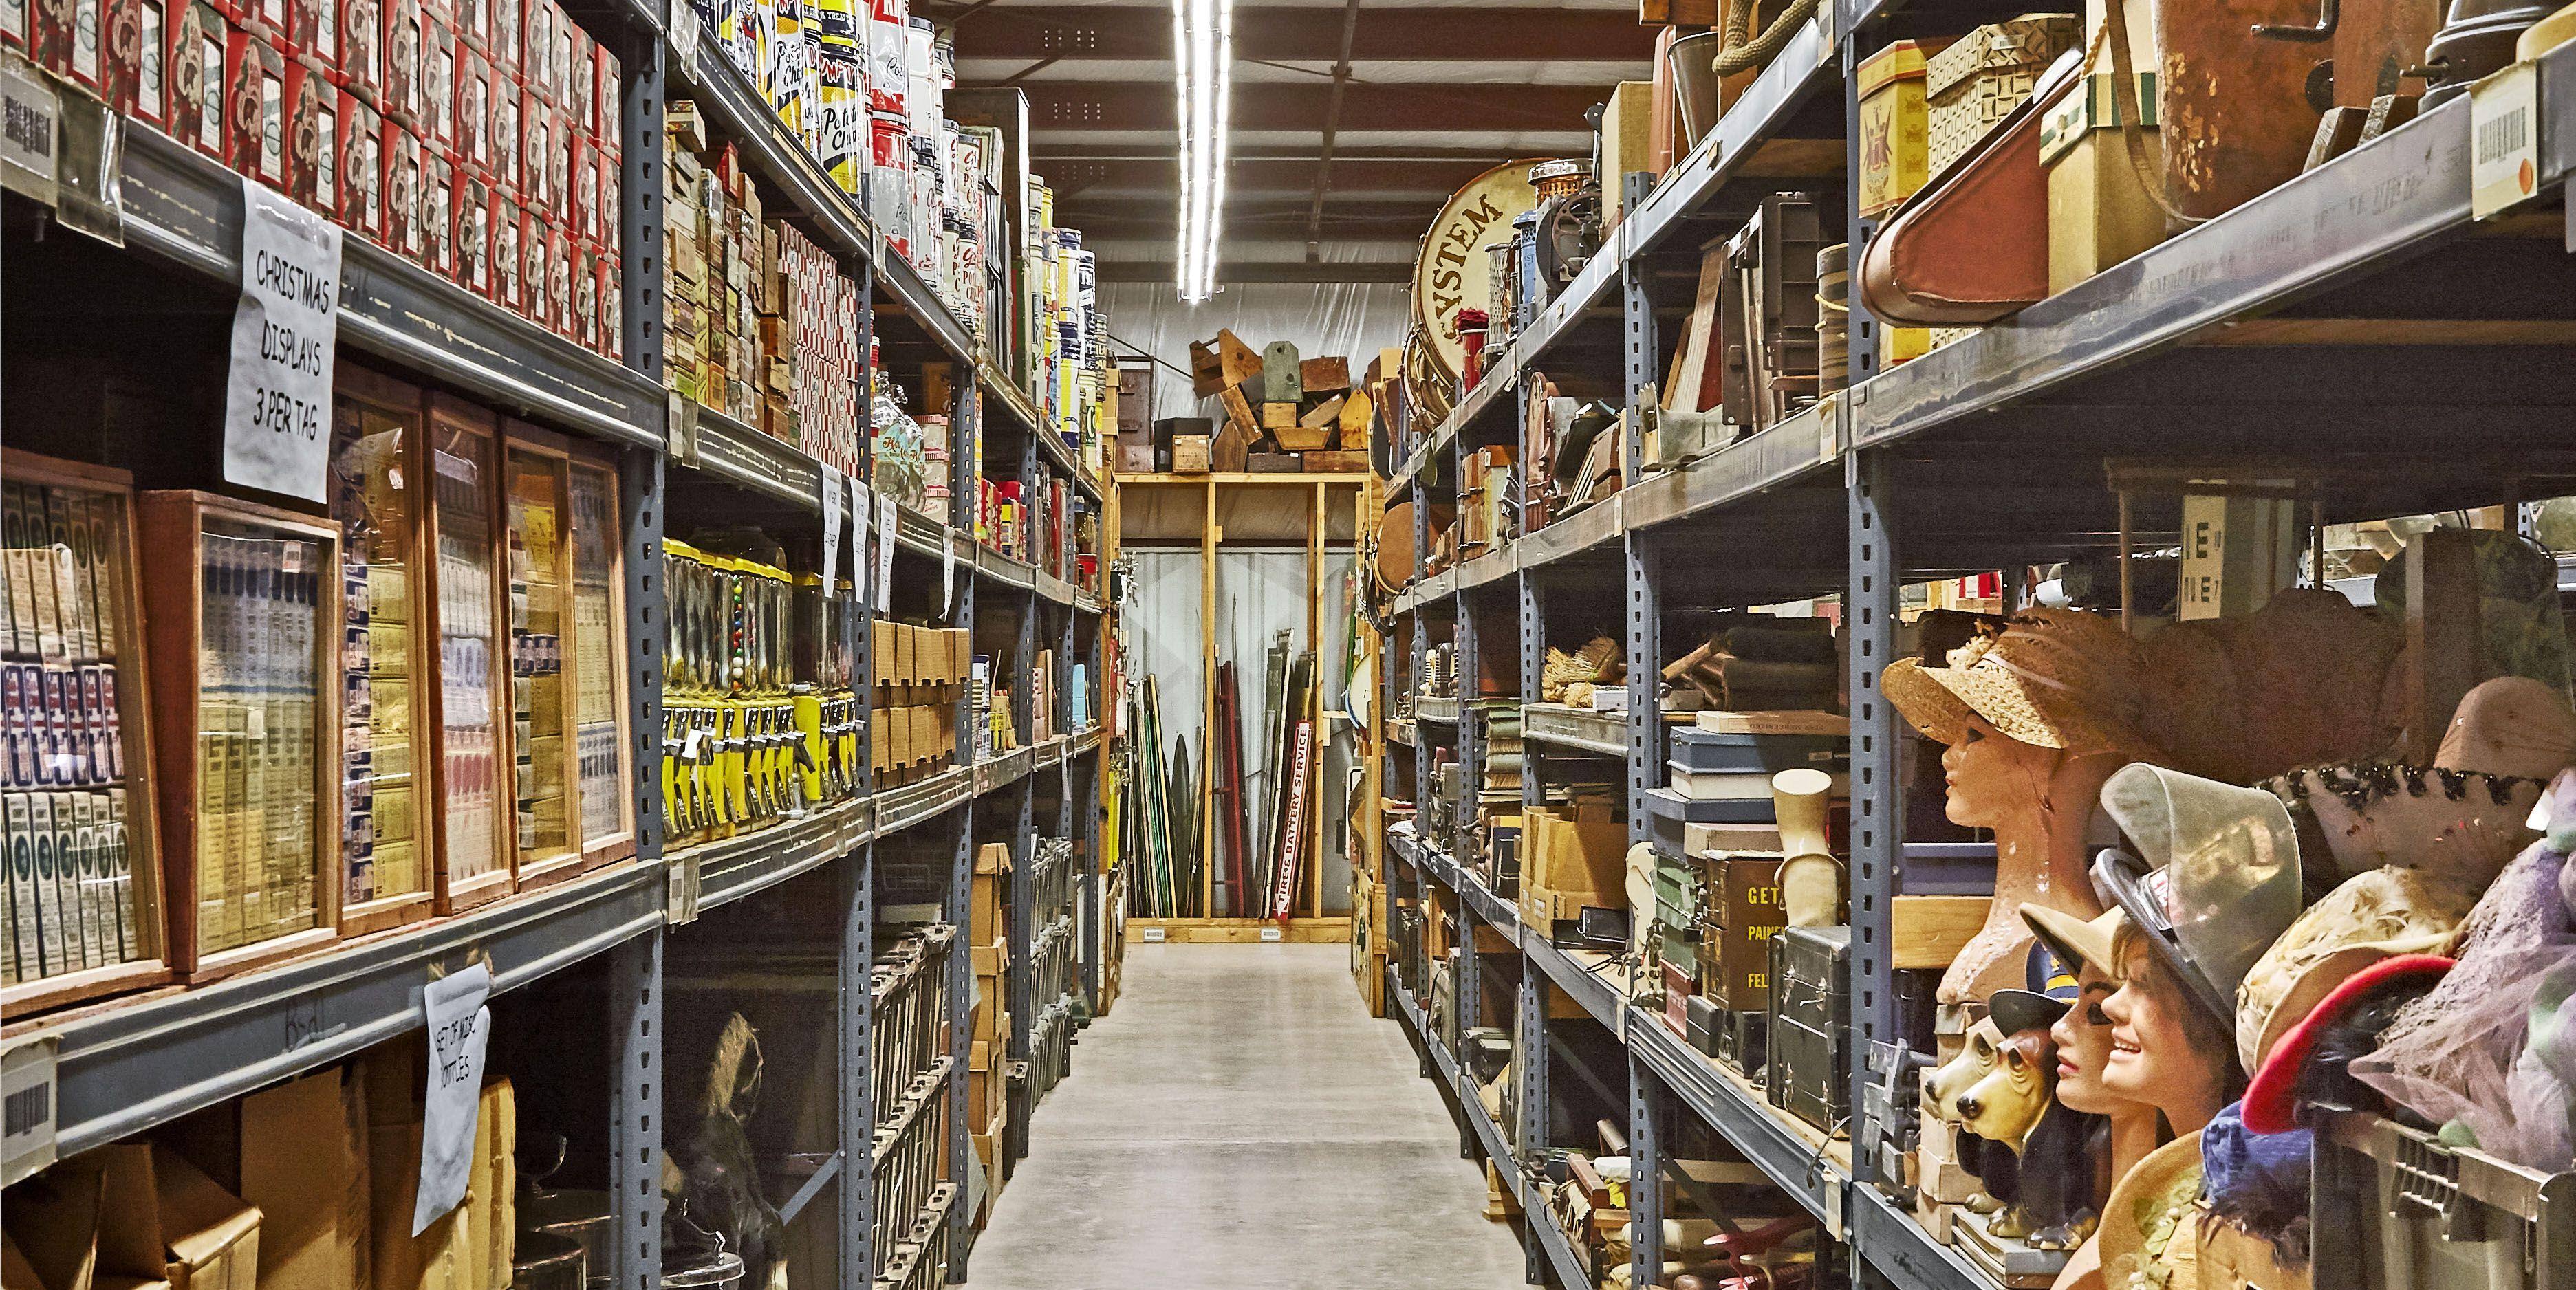 Take a Peek Inside the Cracker Barrel Antiques Warehouse